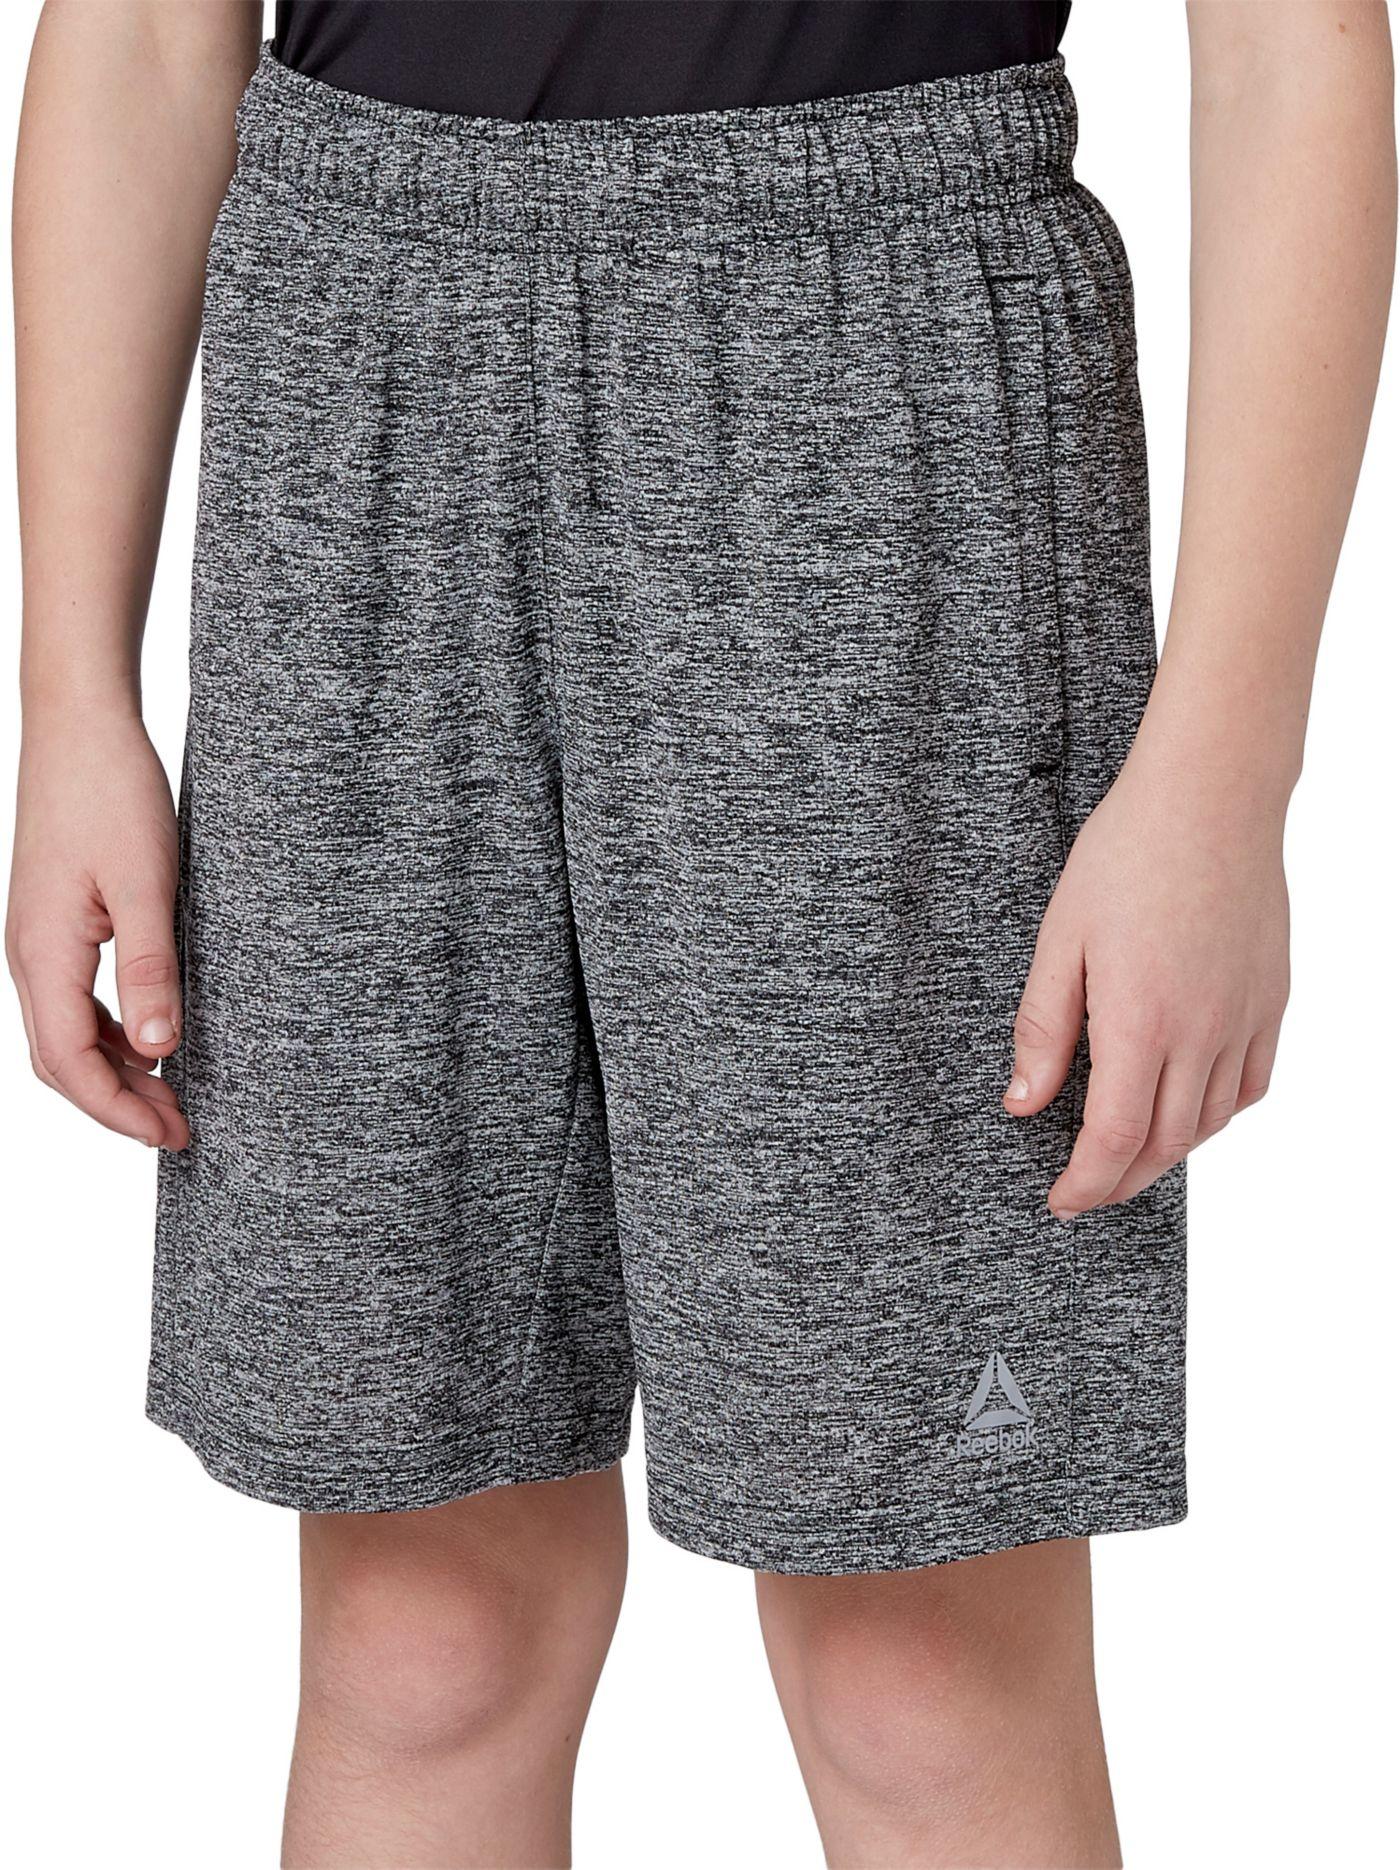 Reebok Boys' Twist Shorts